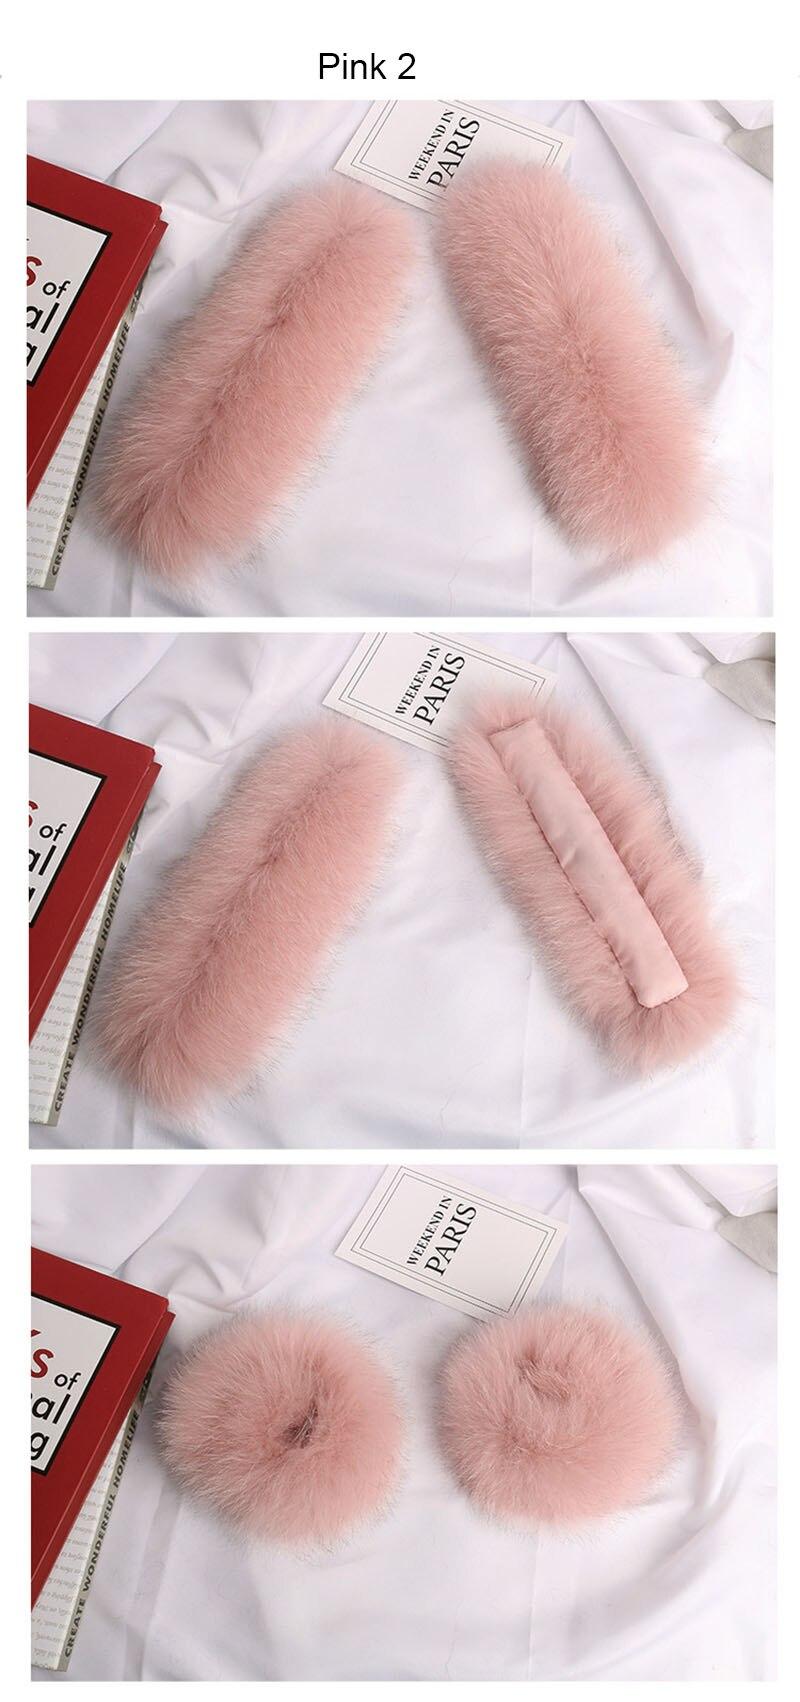 fox fur slap cuffs color pink 2